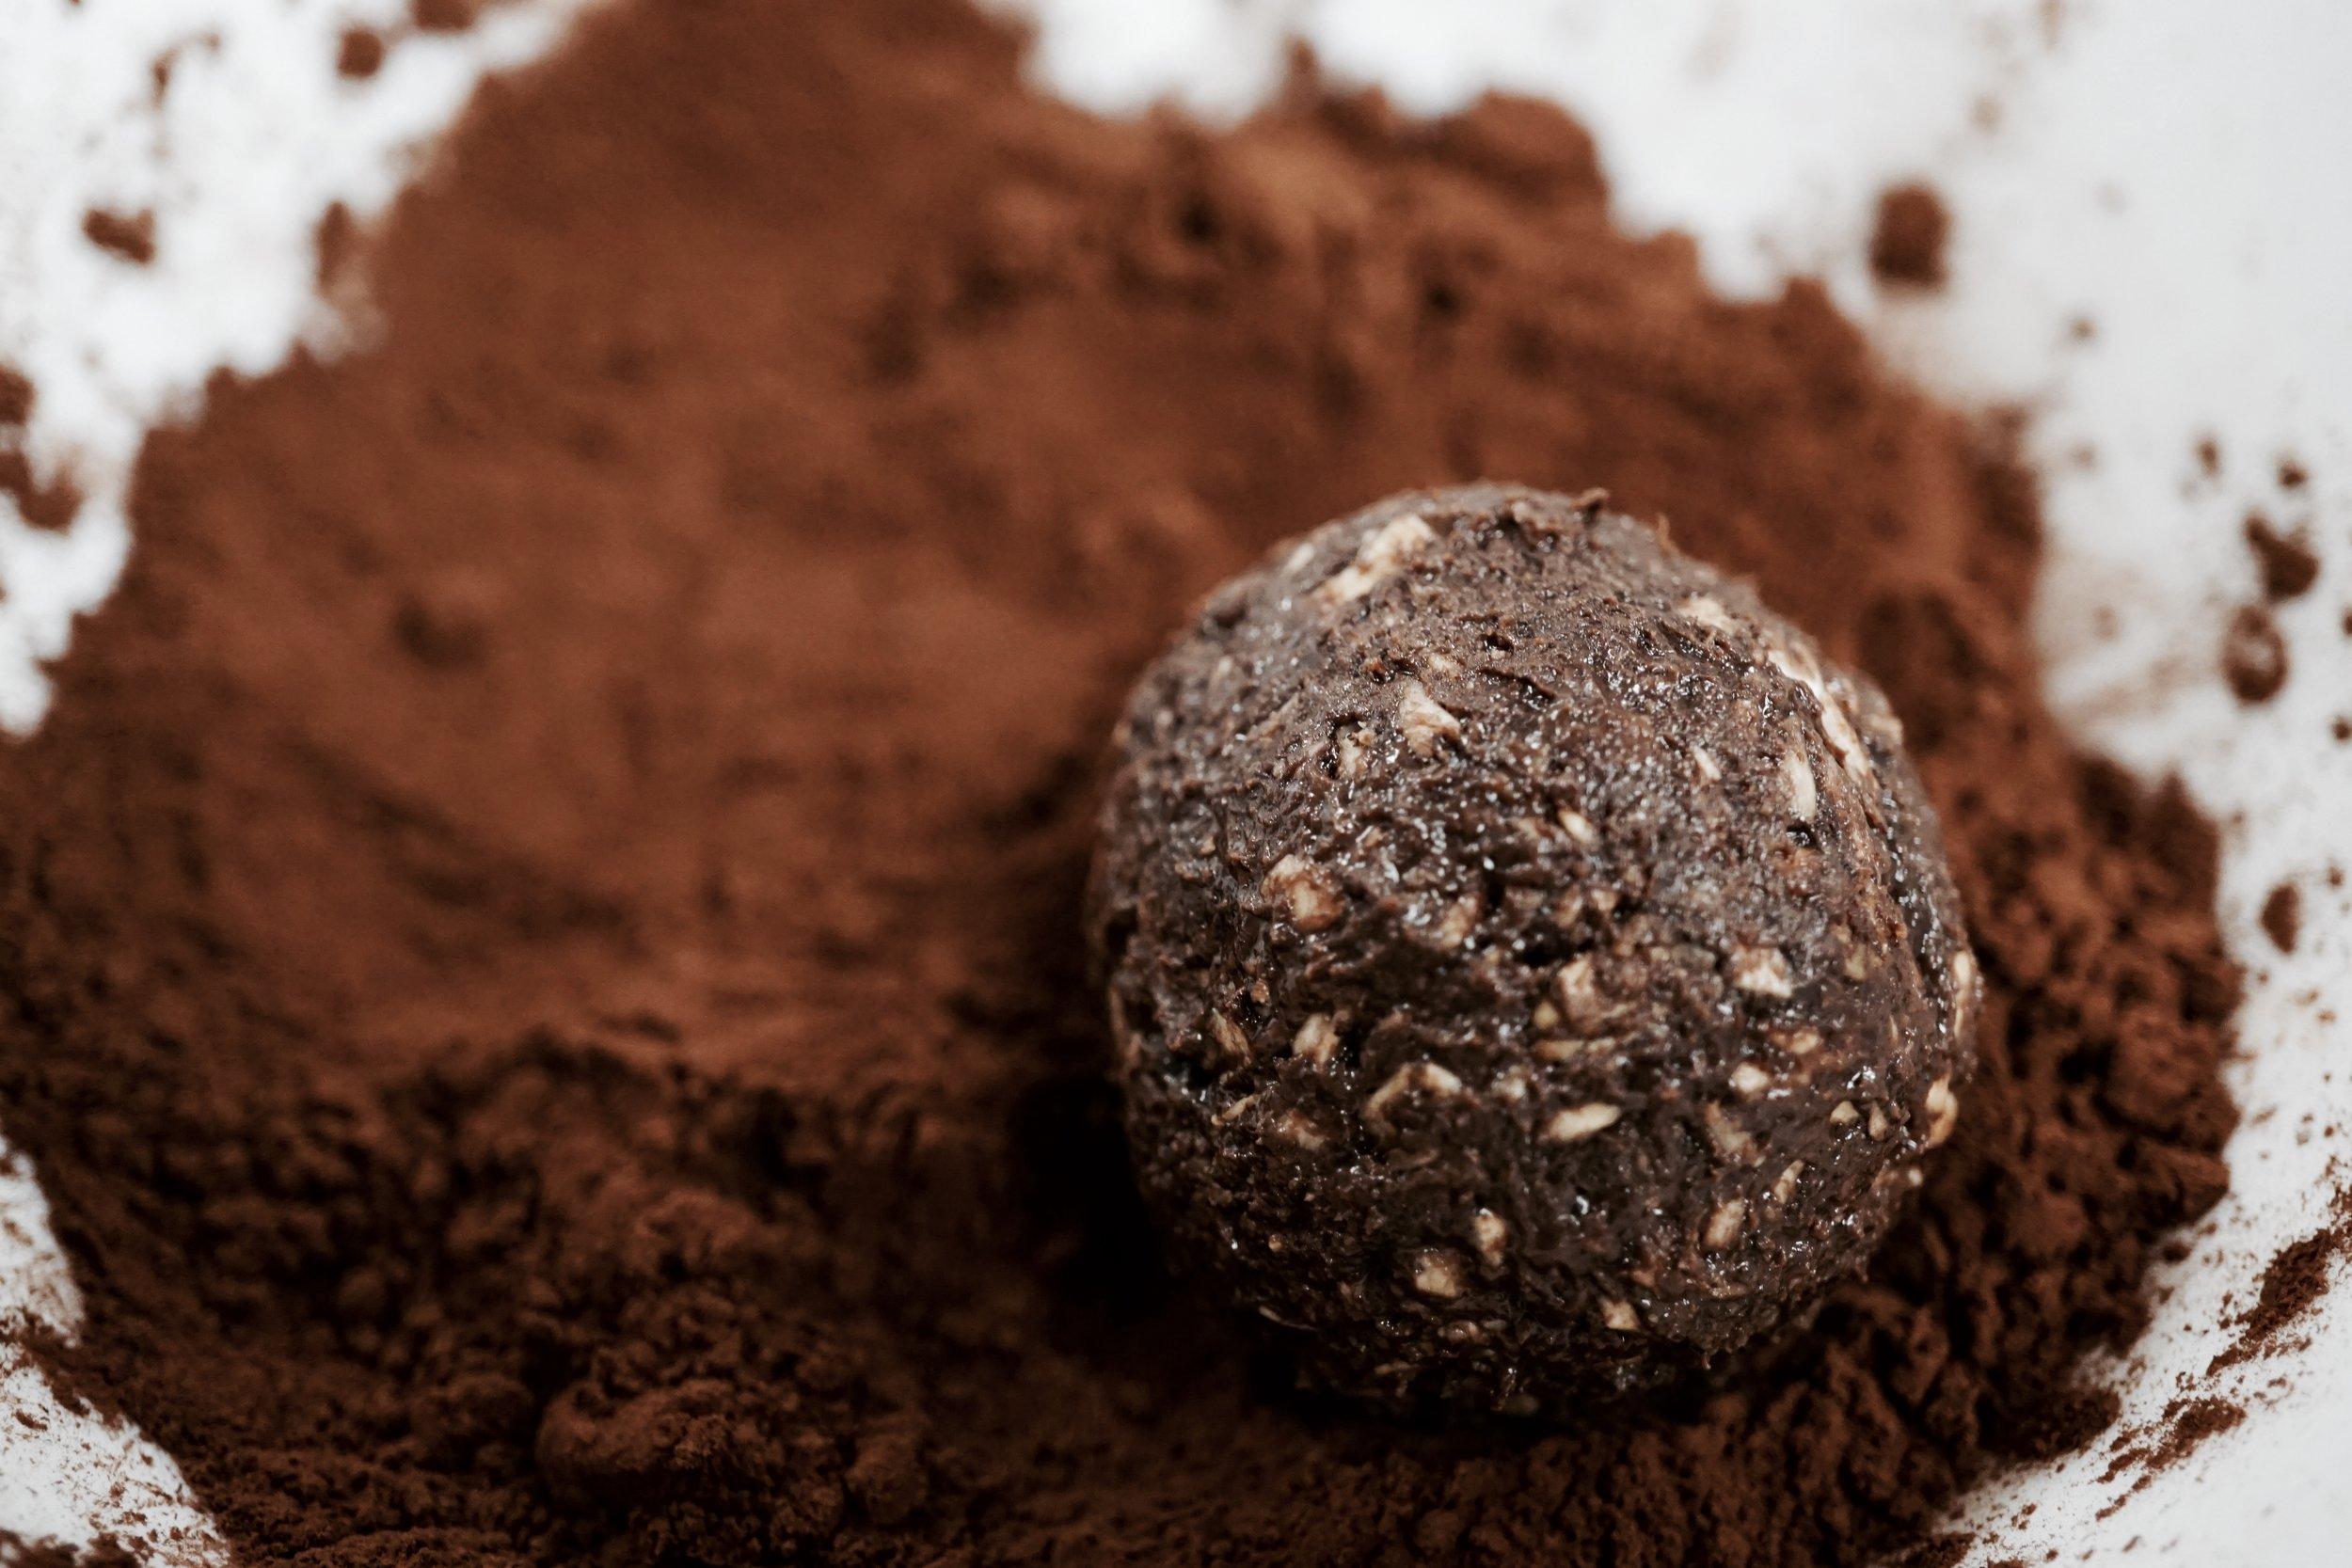 Cocoa powder and chokladbollar